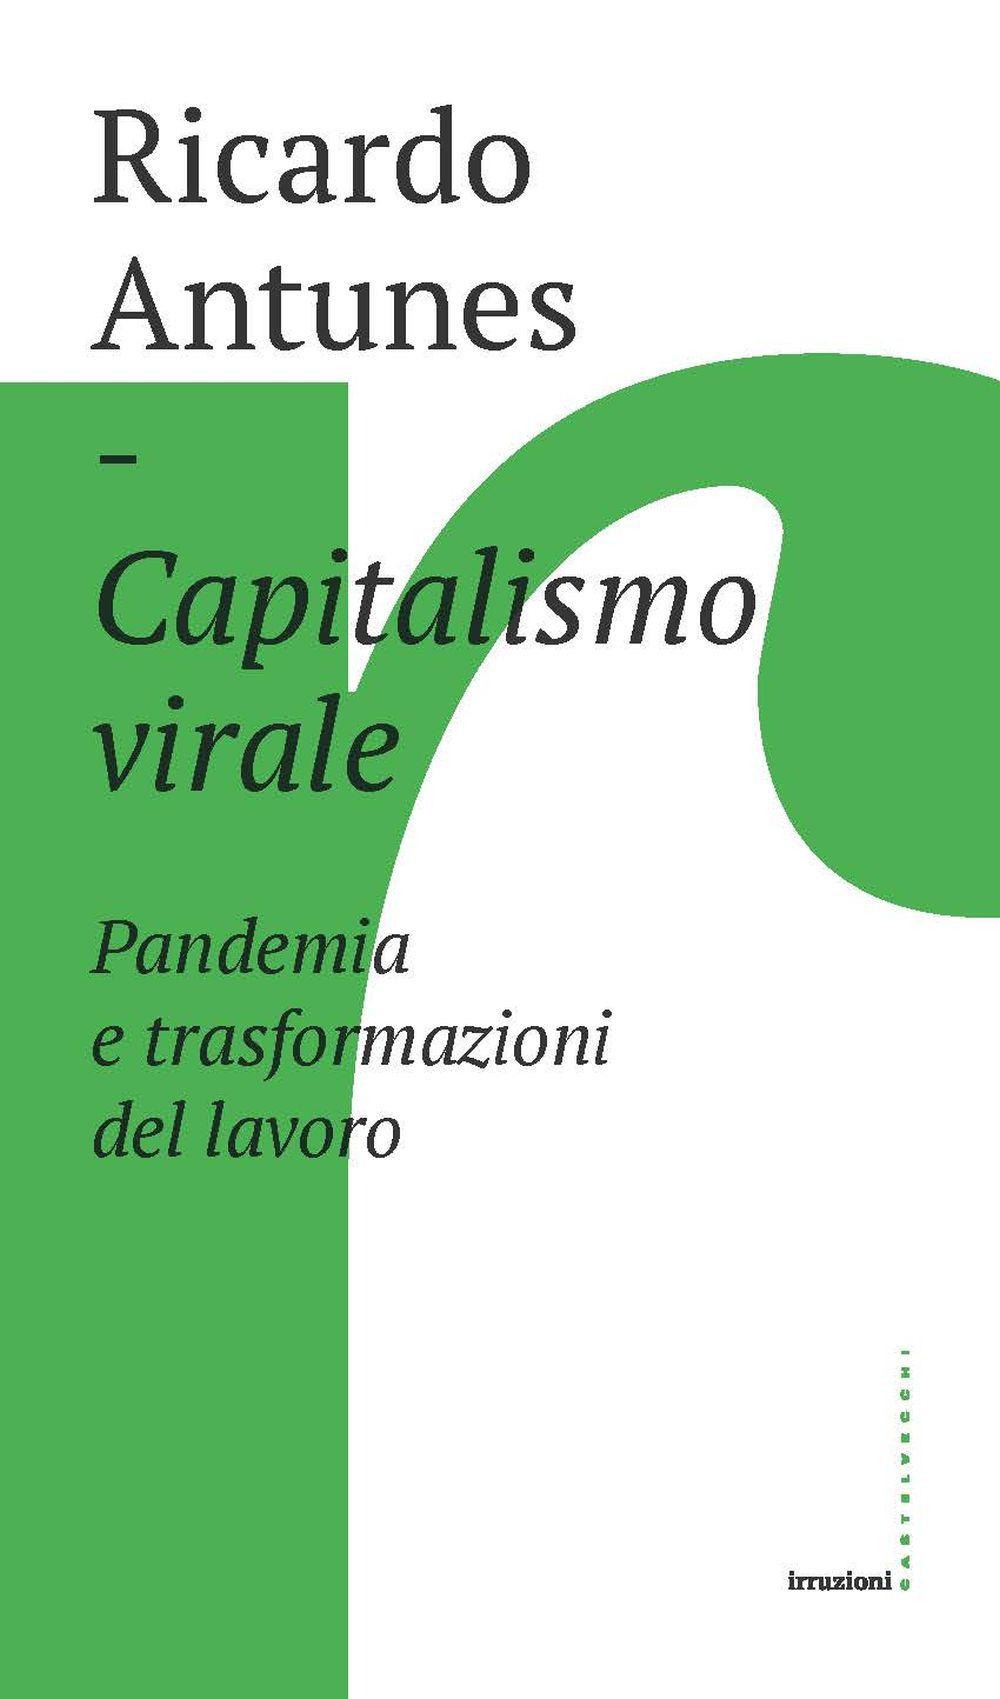 CAPITALISMO VIRALE - RICARDO ANTUNES - 9788832902068